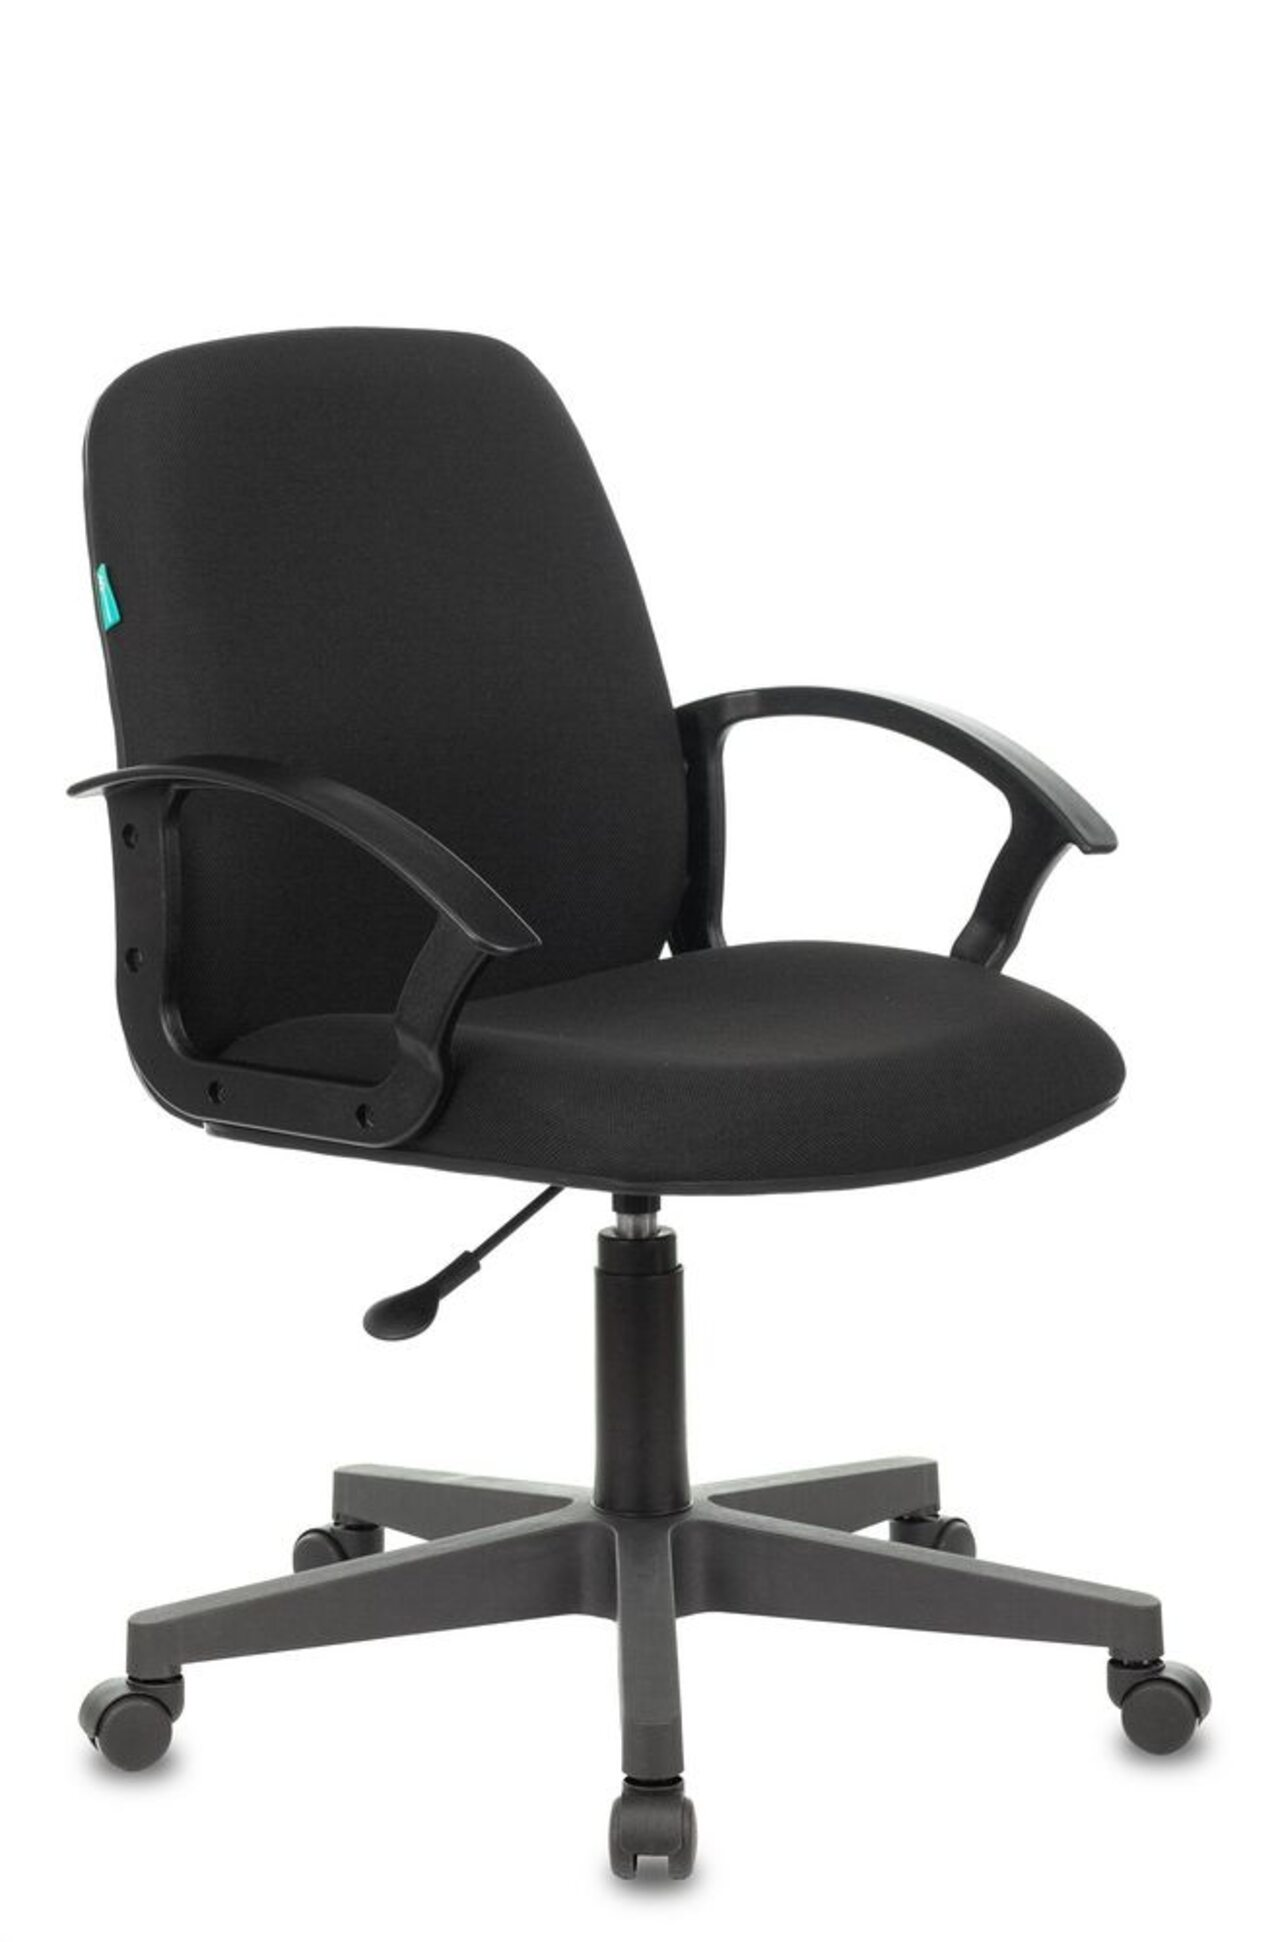 Кресло для персонала CH-808-LOW - фото 1